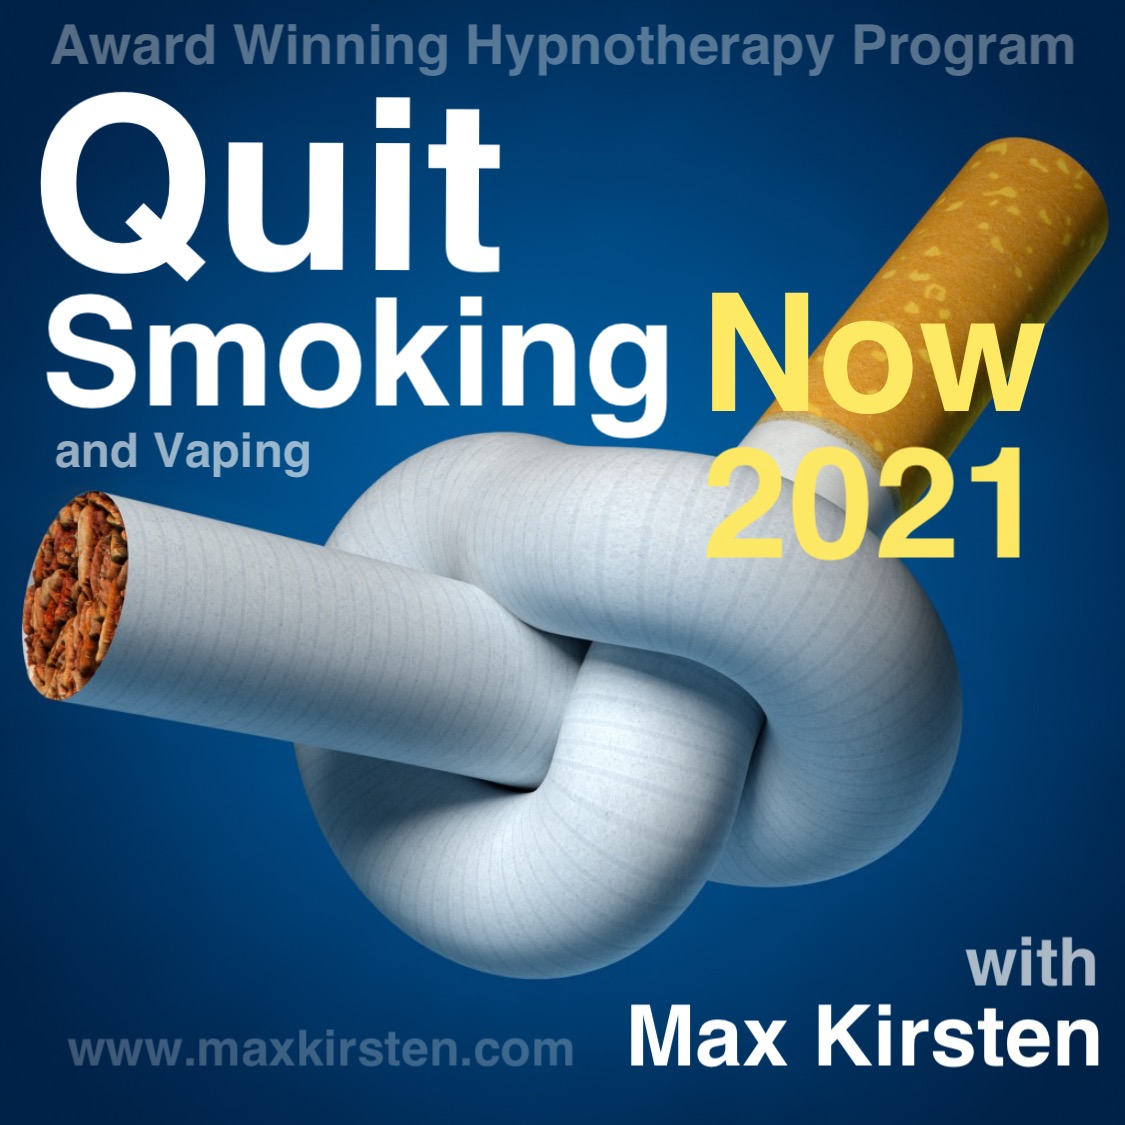 Quit Smoking App By Max Kirsten